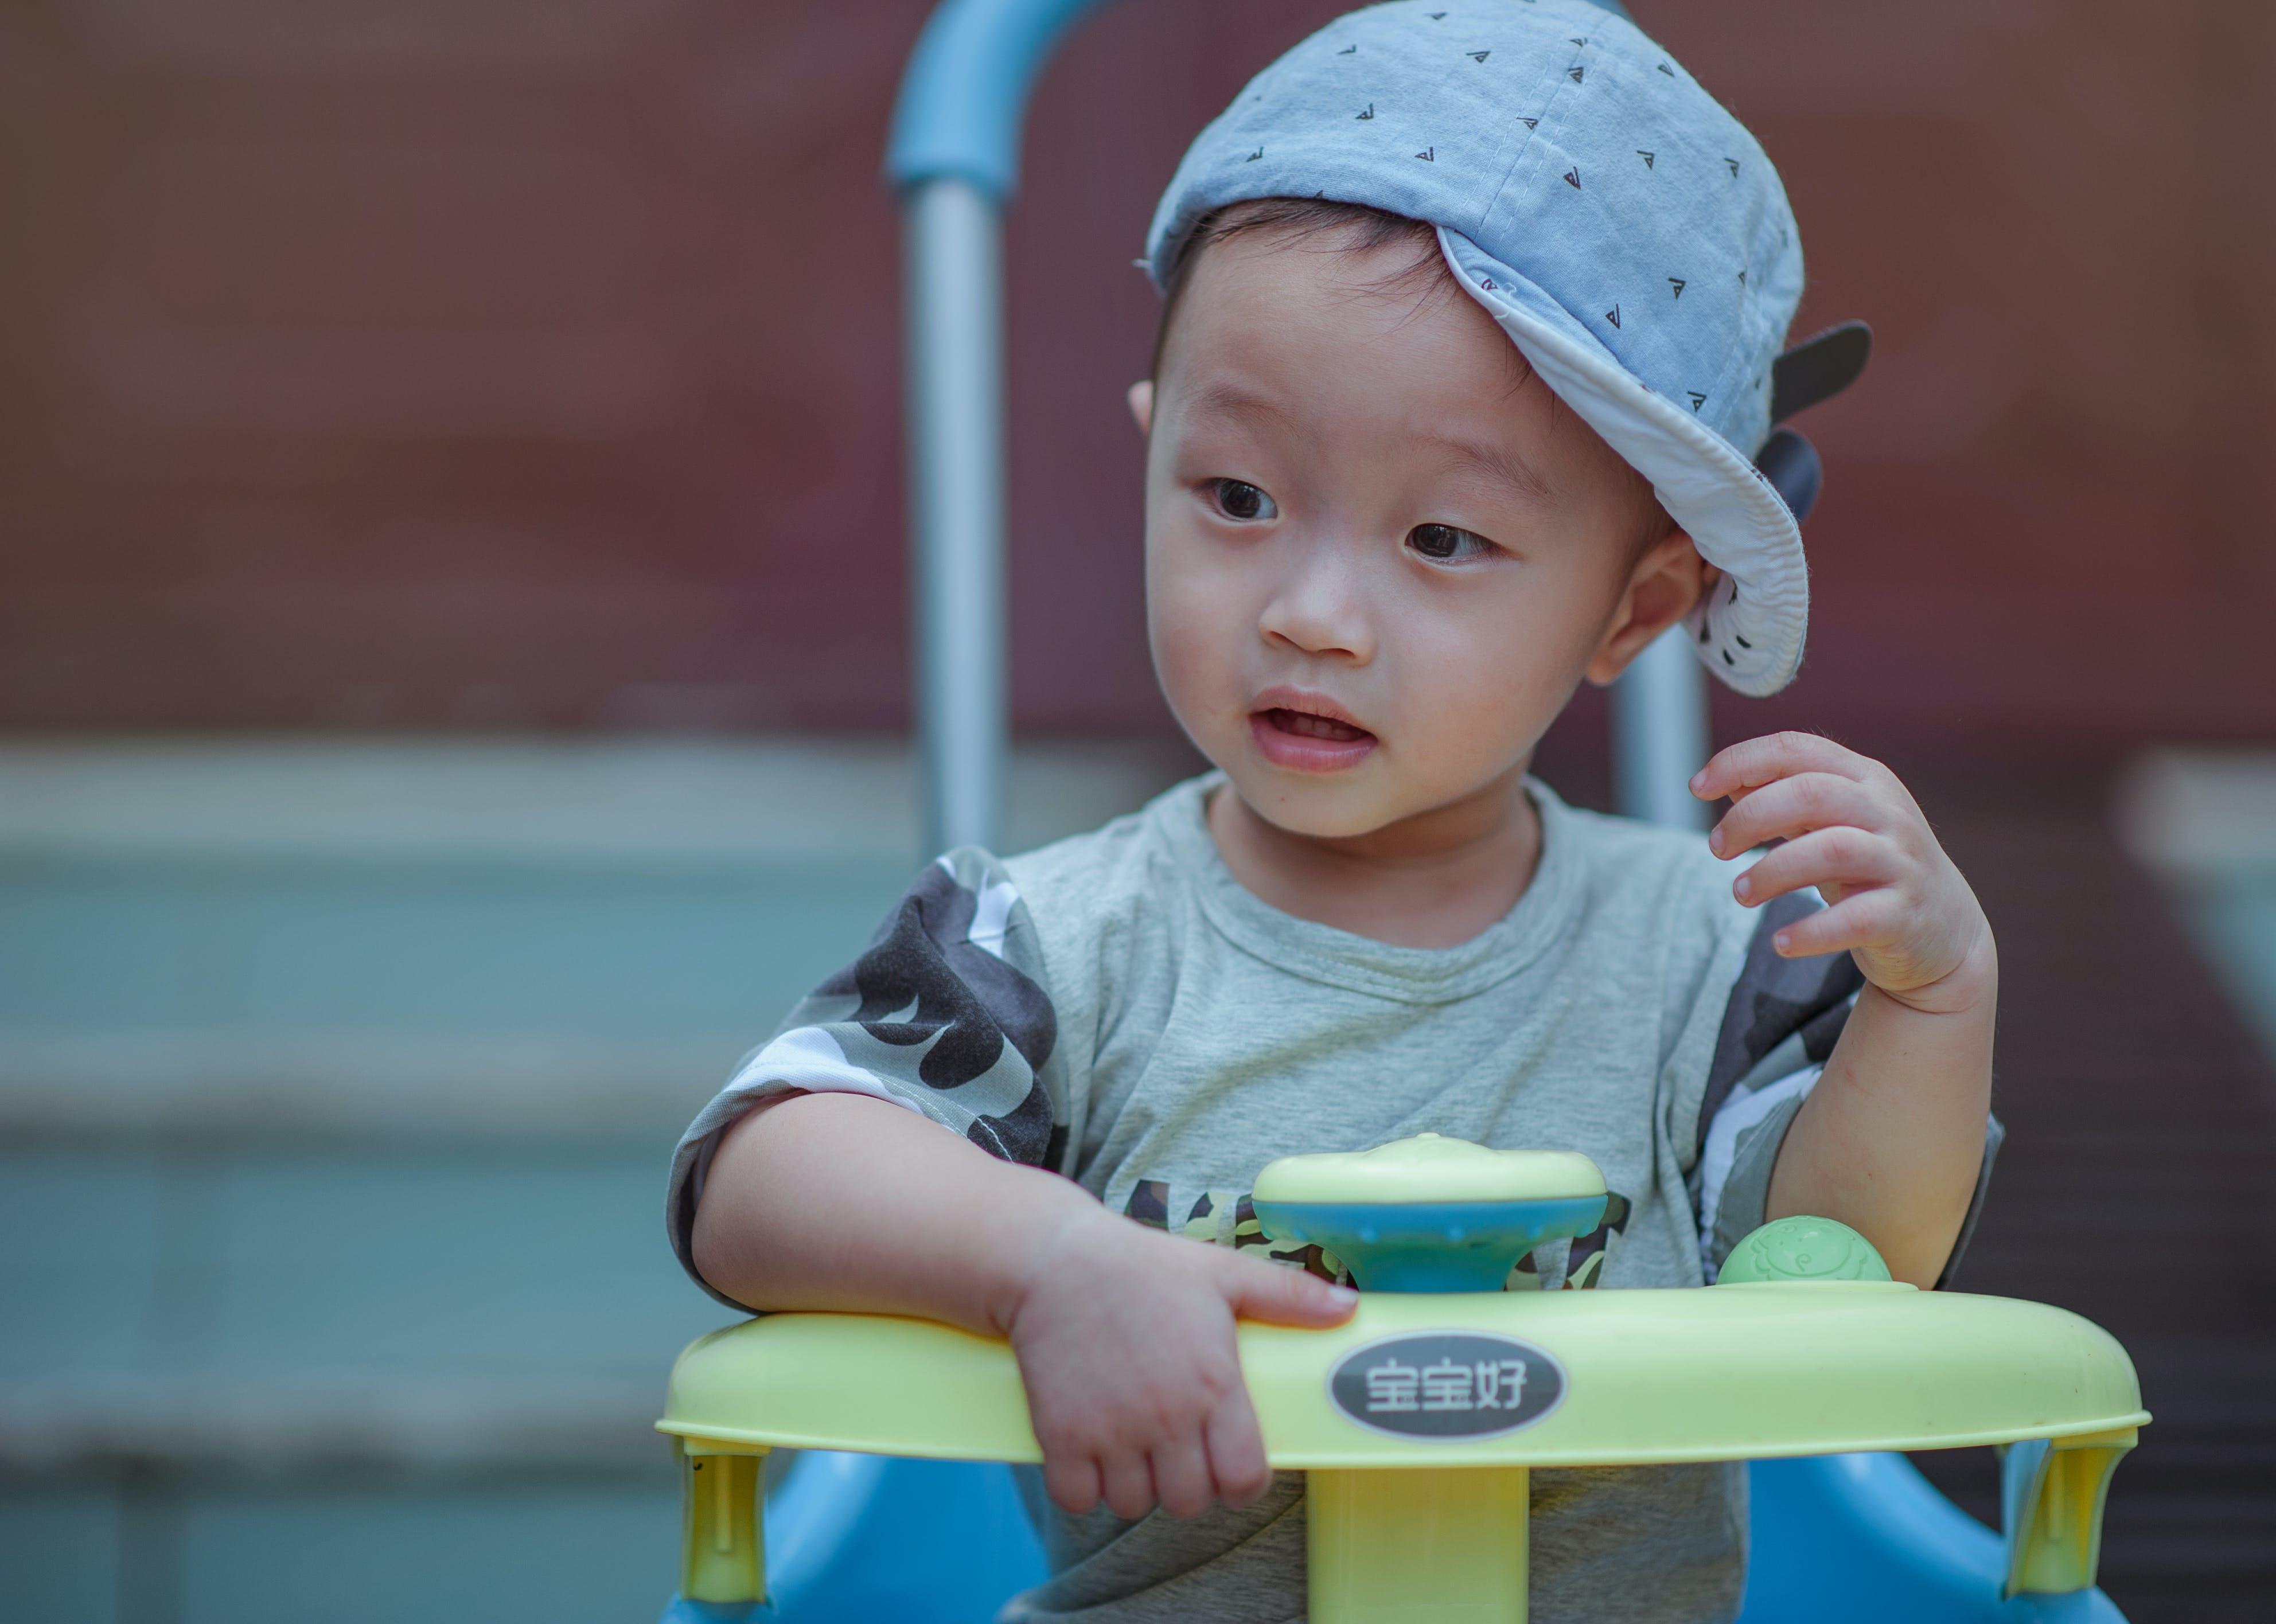 Boy Sitting on Yellow and Blue Trike